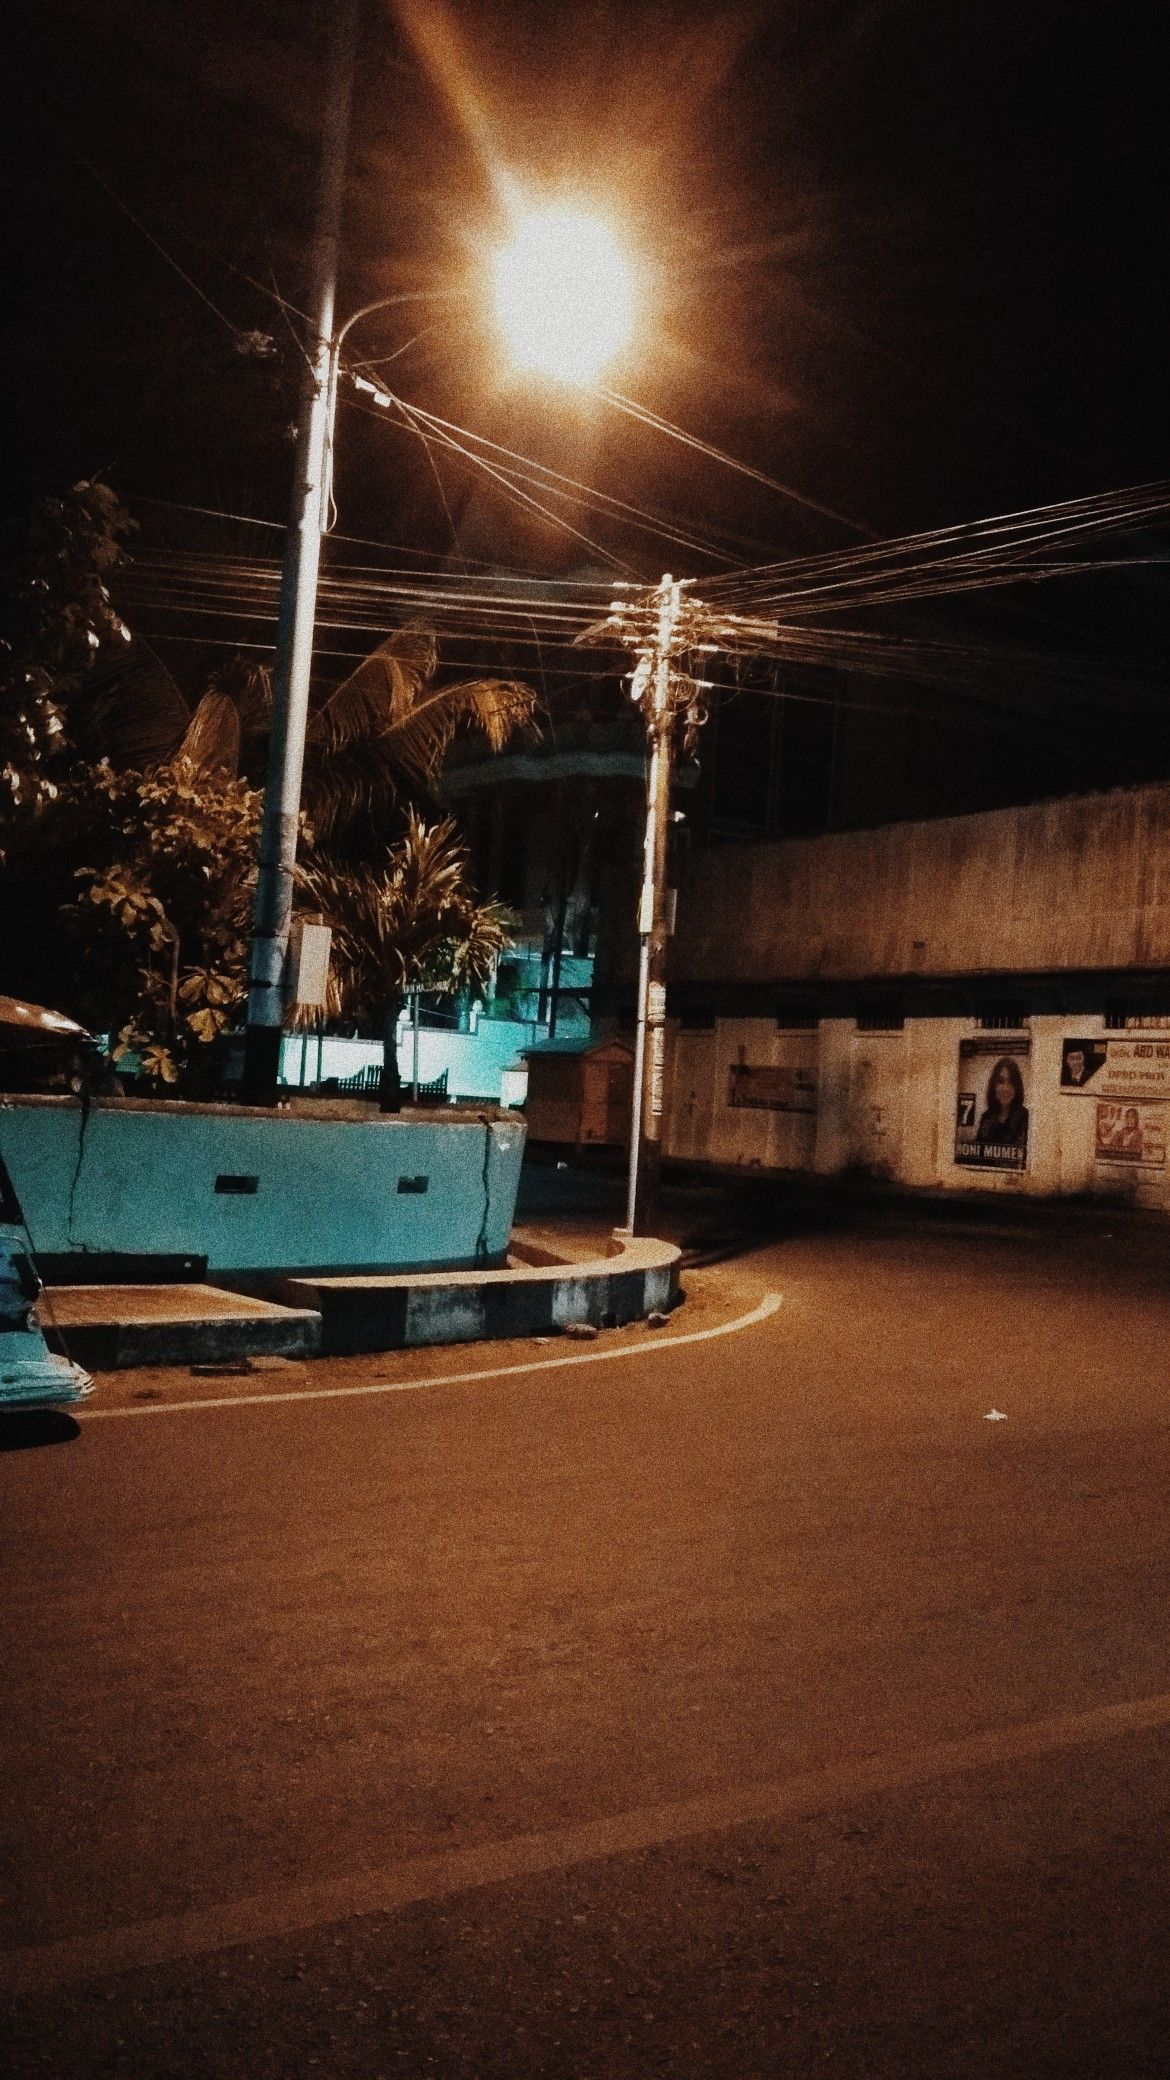 #street #aesthetic #dark #grunge #darkstreet #wallpaper ...